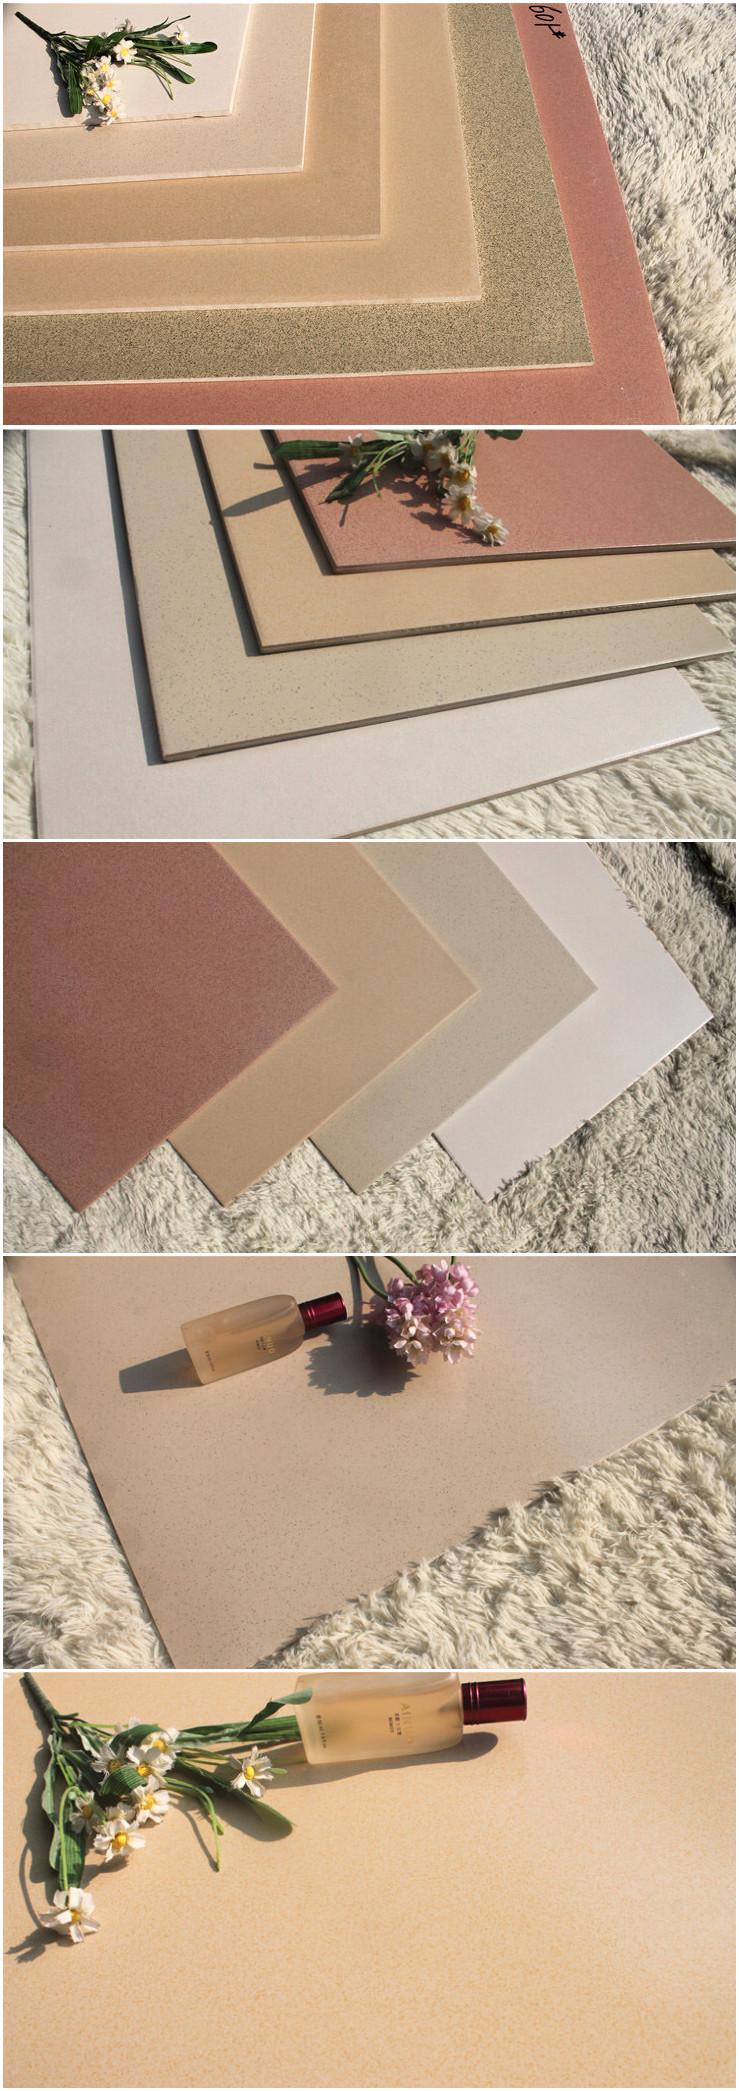 China no slip garden ceramic floor tiles price in kerala design china no slip garden ceramic floor tiles price in kerala design 30x30cm 40x40cm dailygadgetfo Images